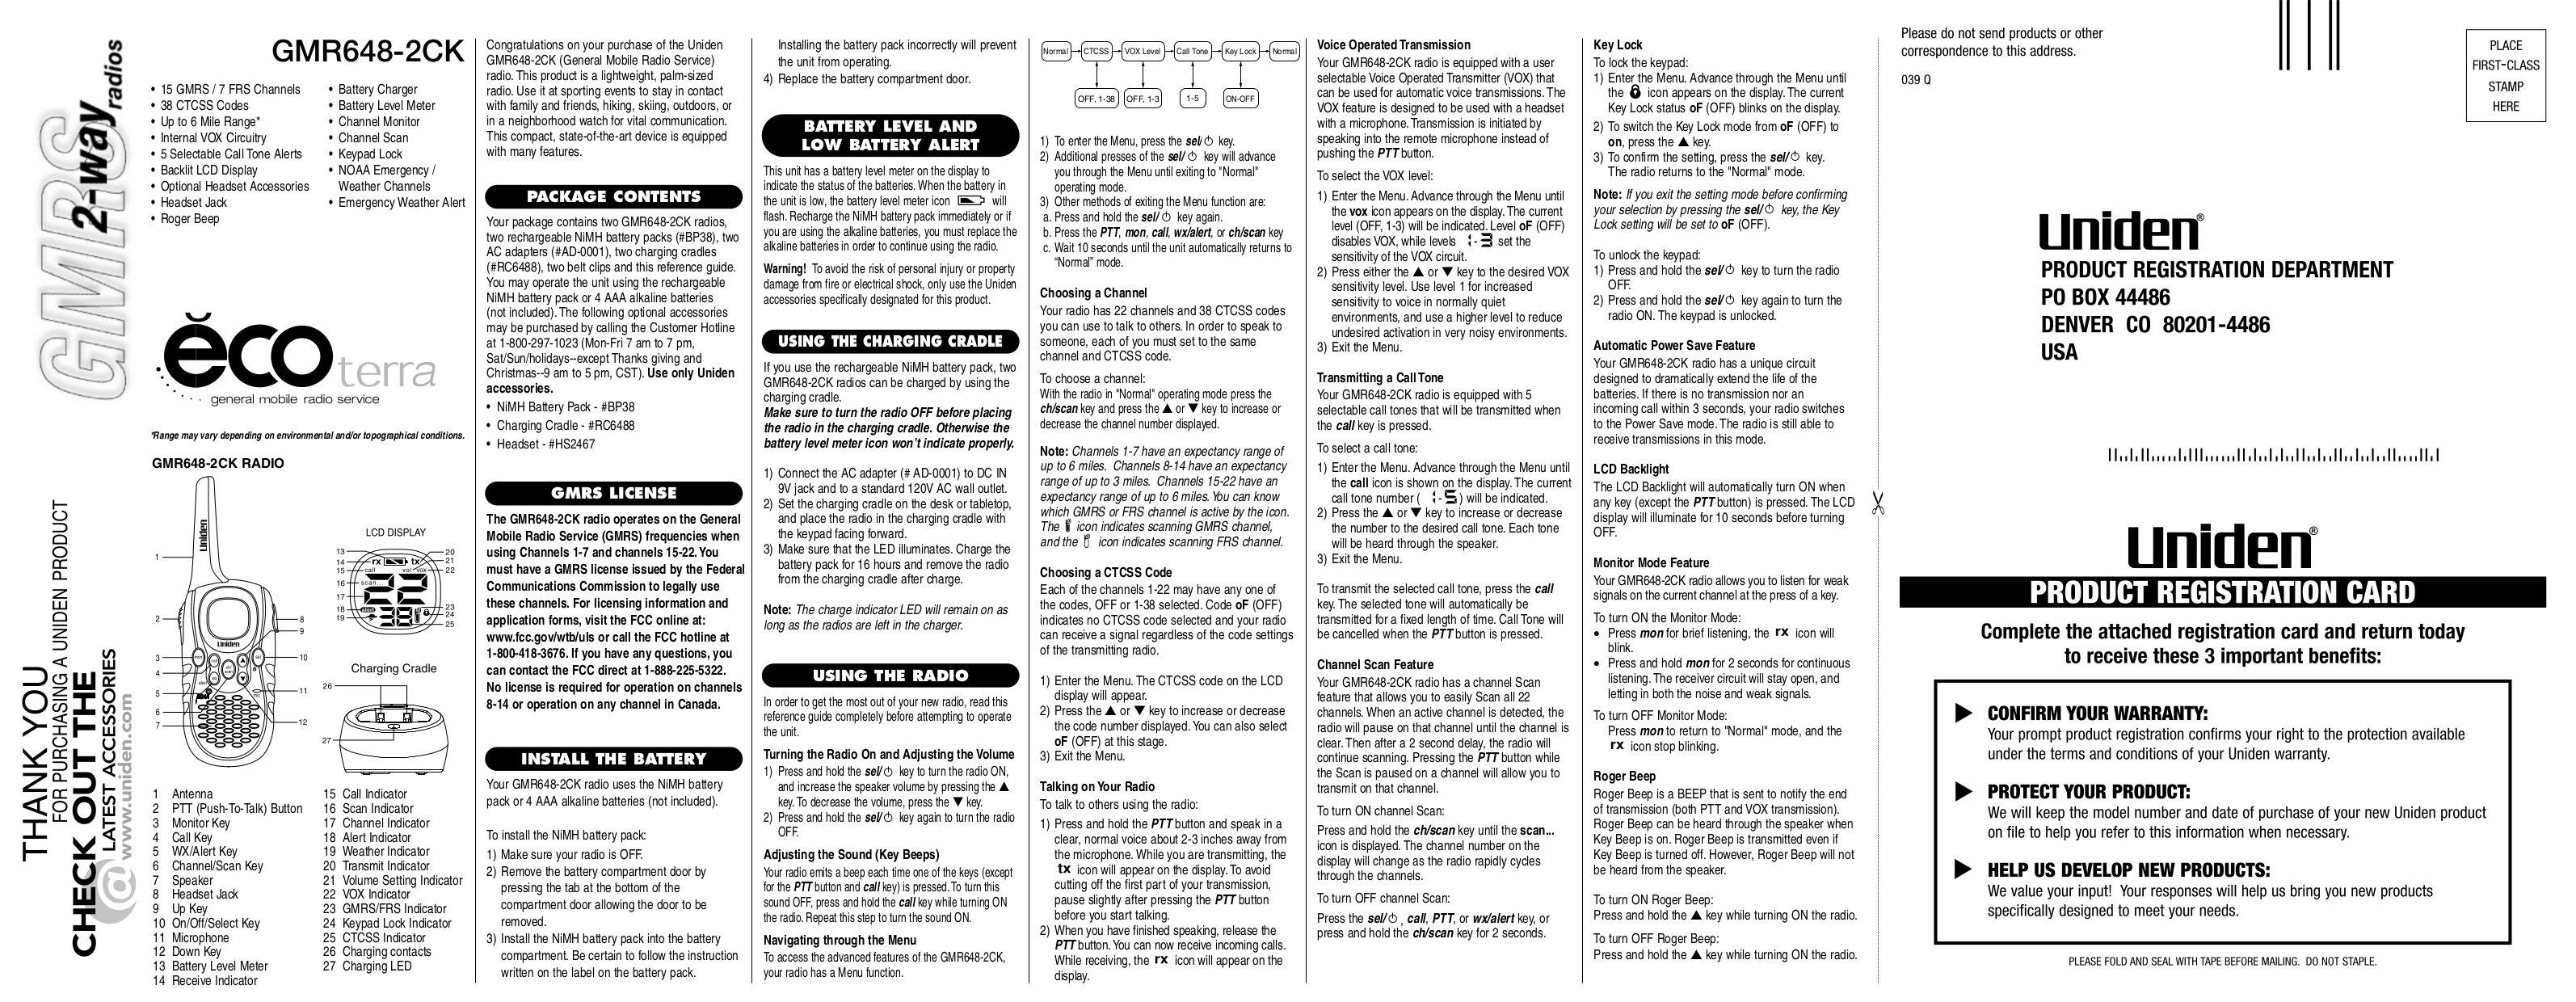 pdf for Uniden 2-way Radio GMR648-2CK manual